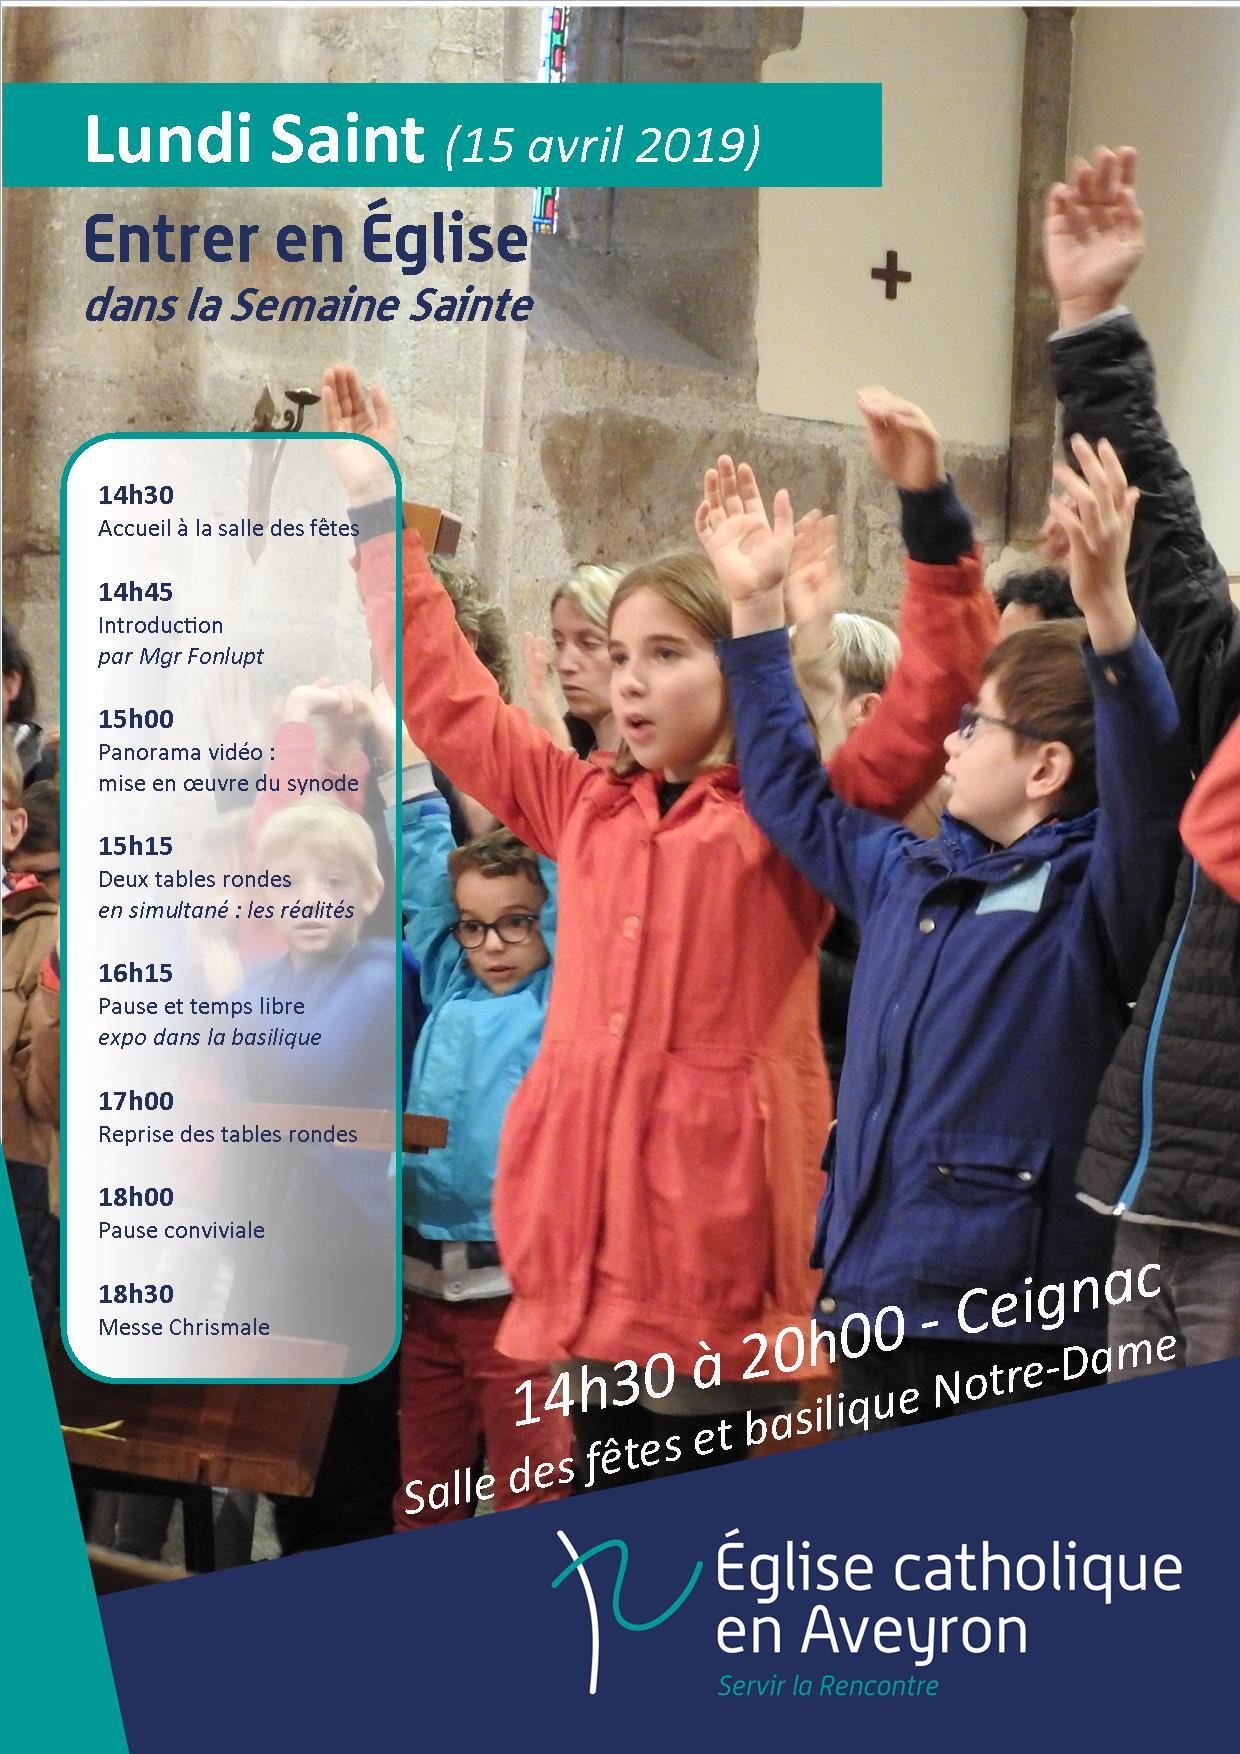 Lundi Saint diocésain à Ceignac, lundi 15 avril 14h30, avec la messe chrismale à 18h30